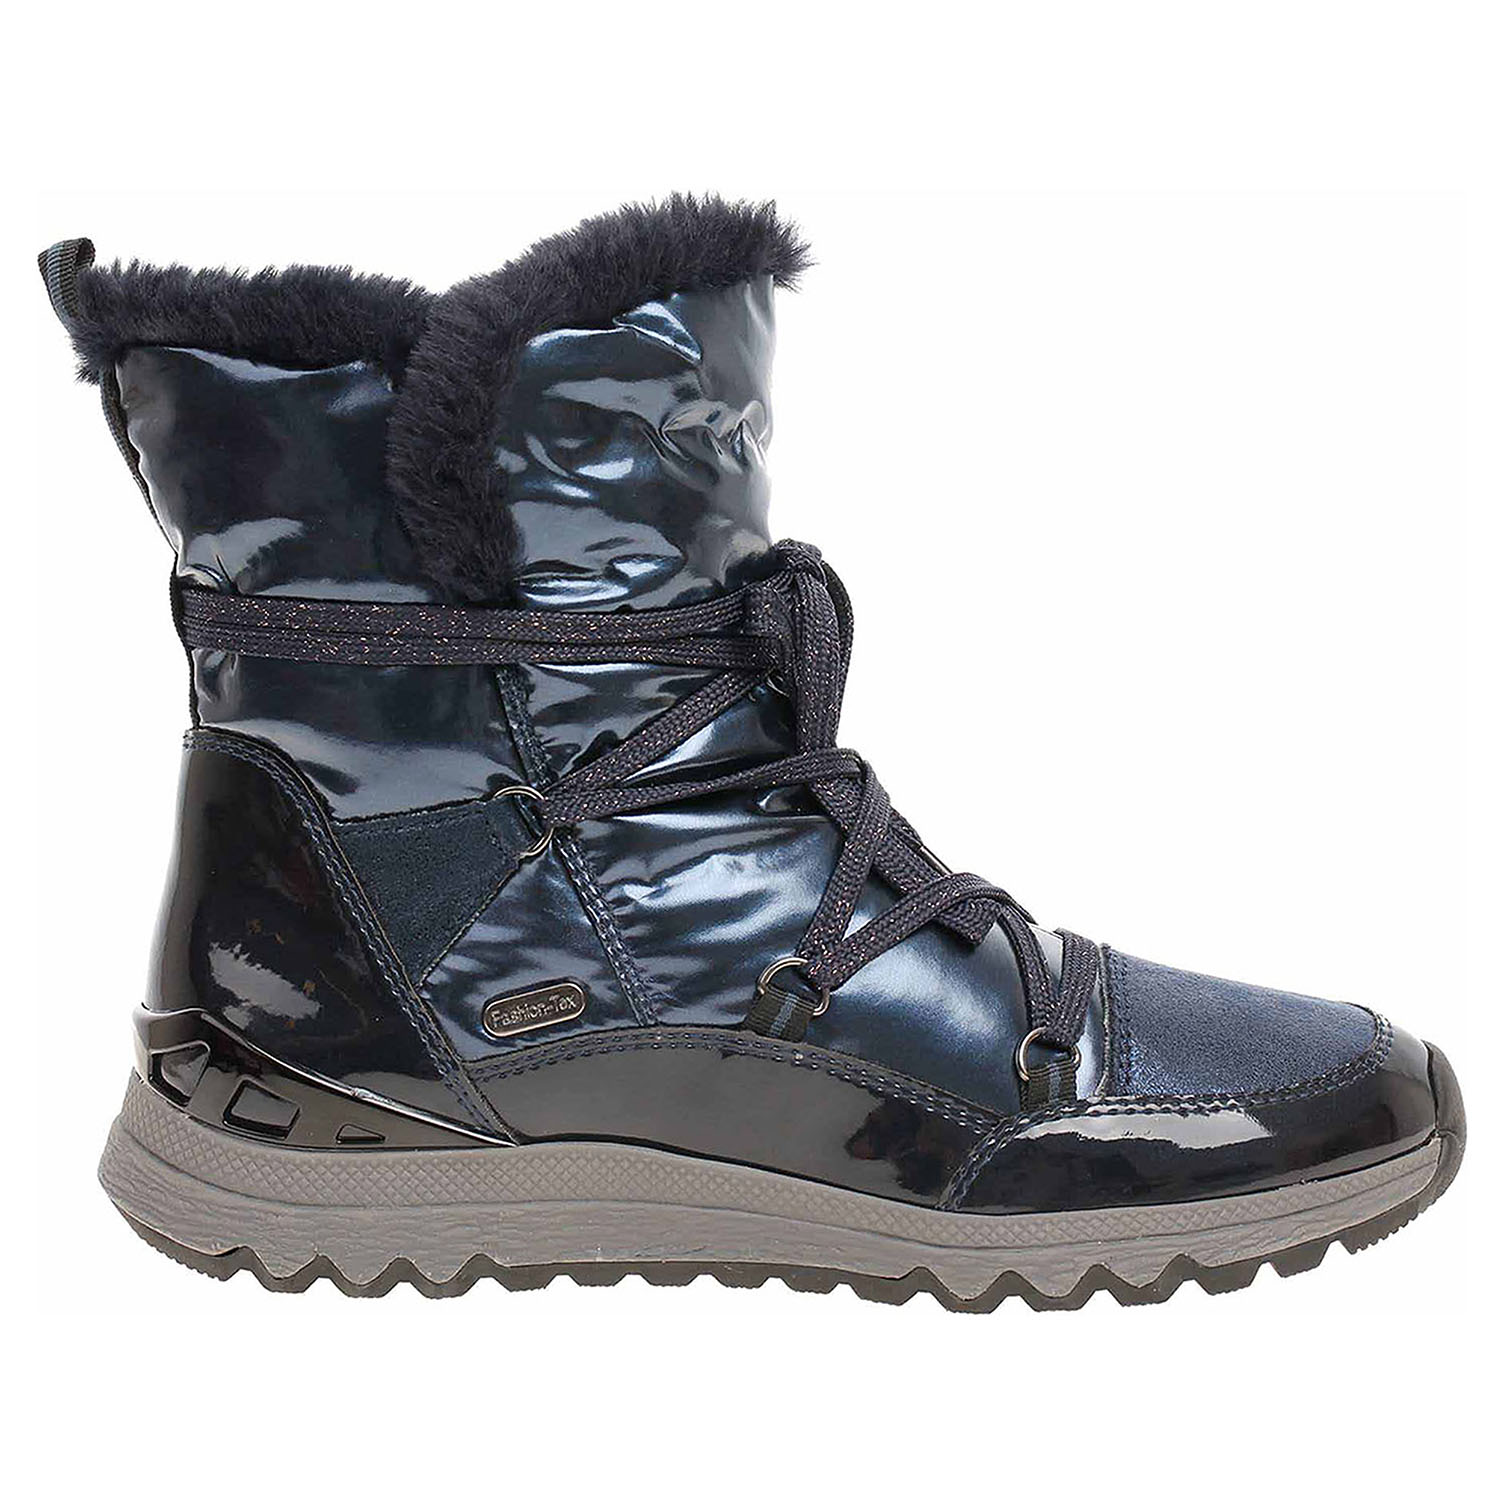 Ecco Marco Tozzi dámská obuv 2-26831-21 navy comb 22400773 4474226883f